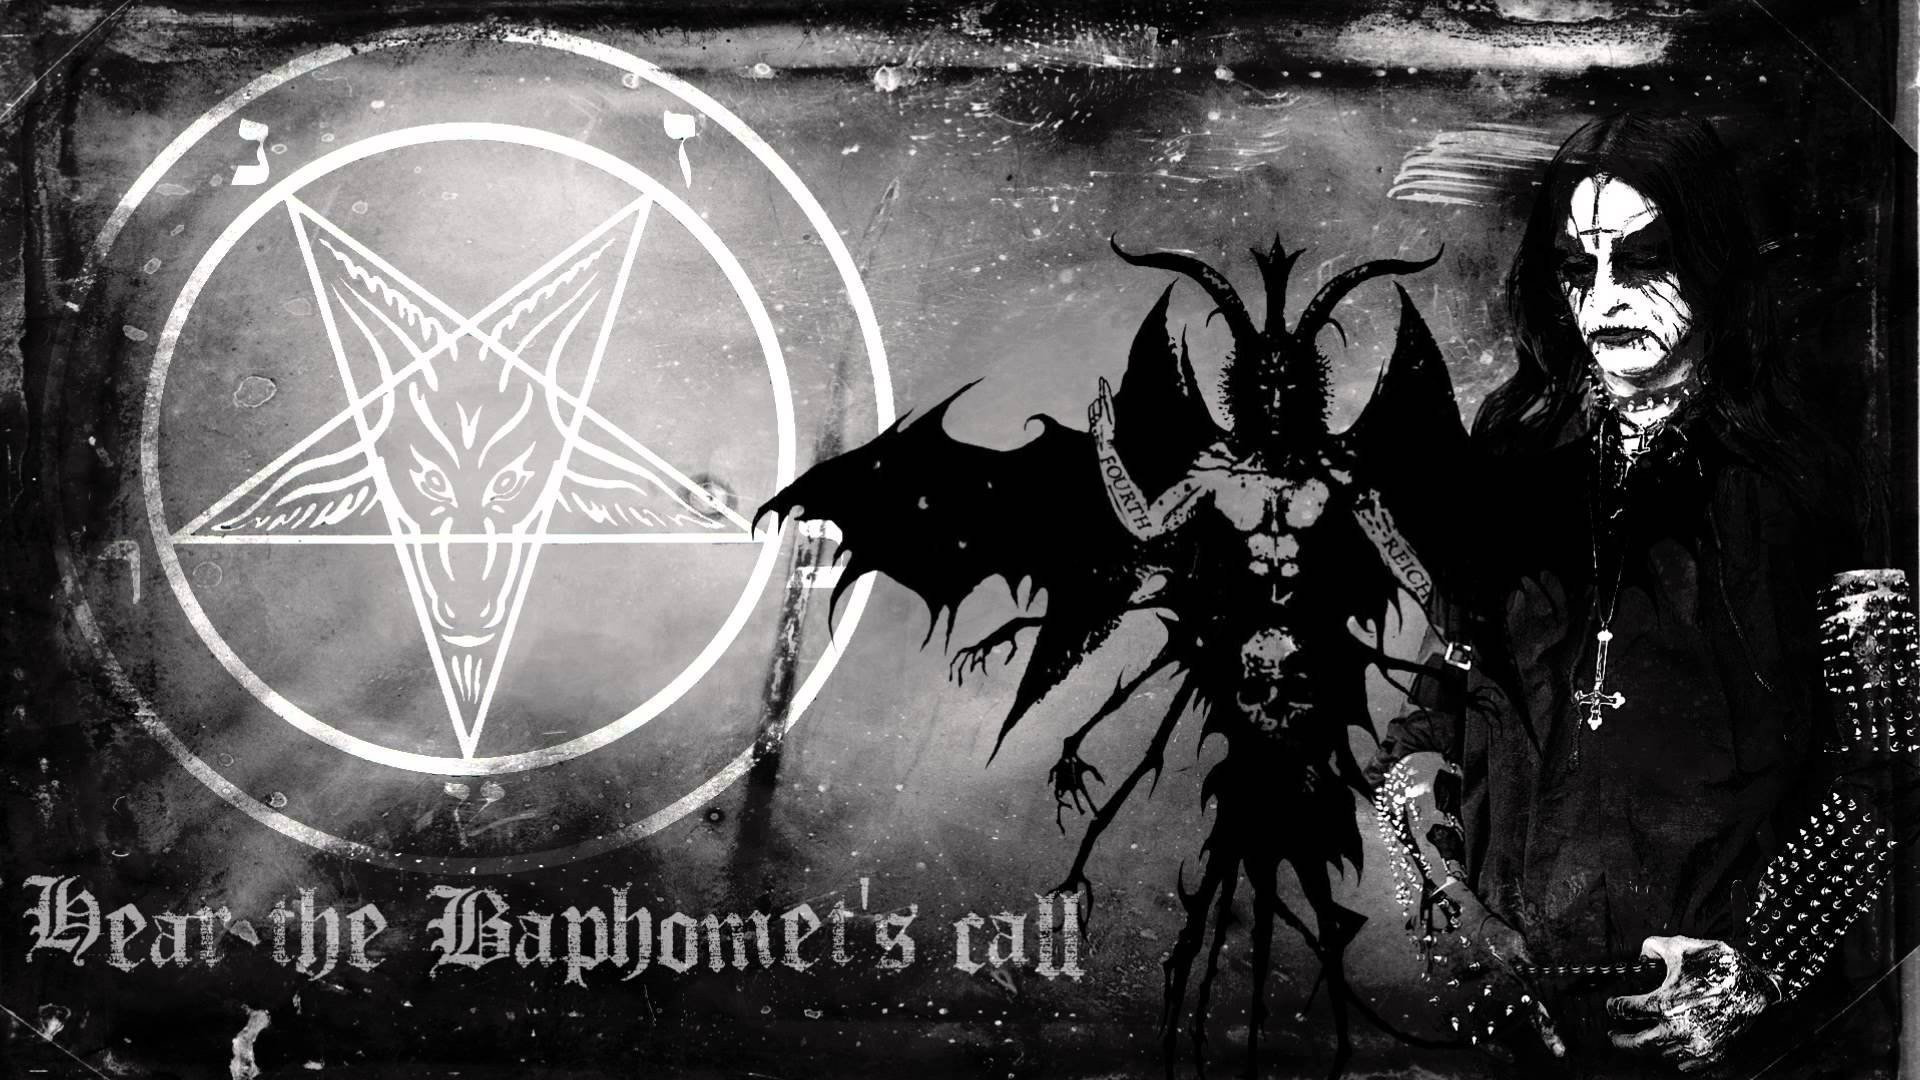 Res: 1920x1080, BEHEXEN black metal heavy poster dark occult satanic pentagram wallpaper